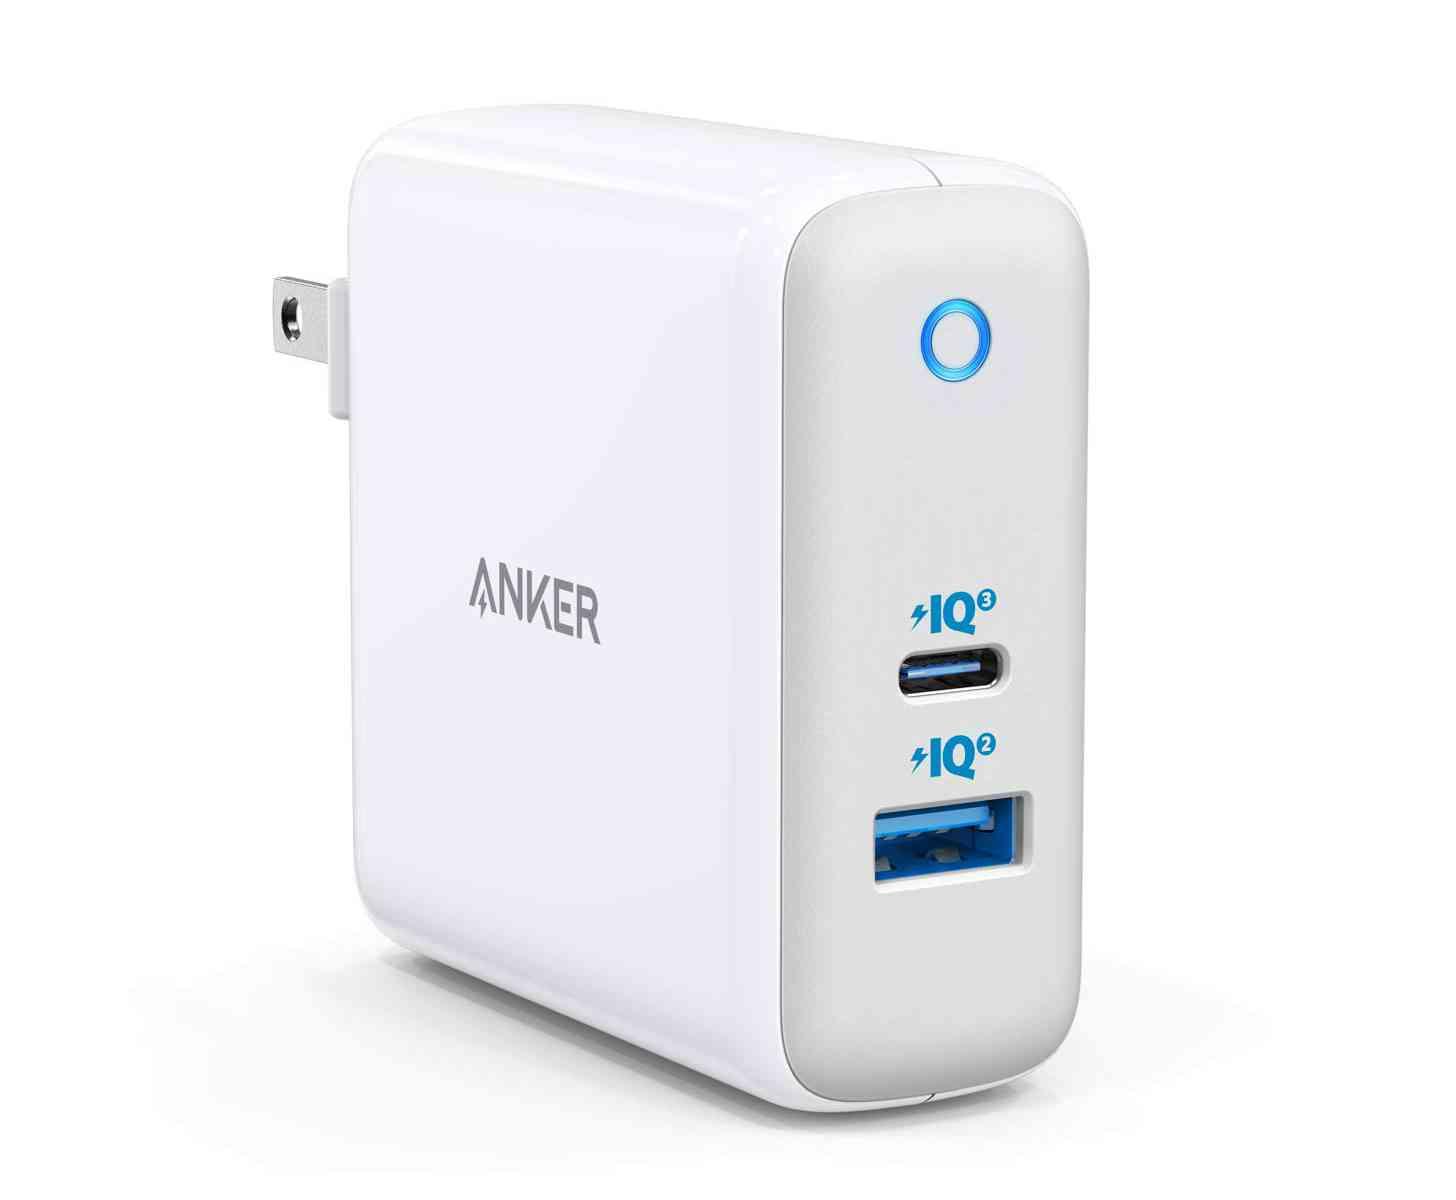 Anker GaN wall charger